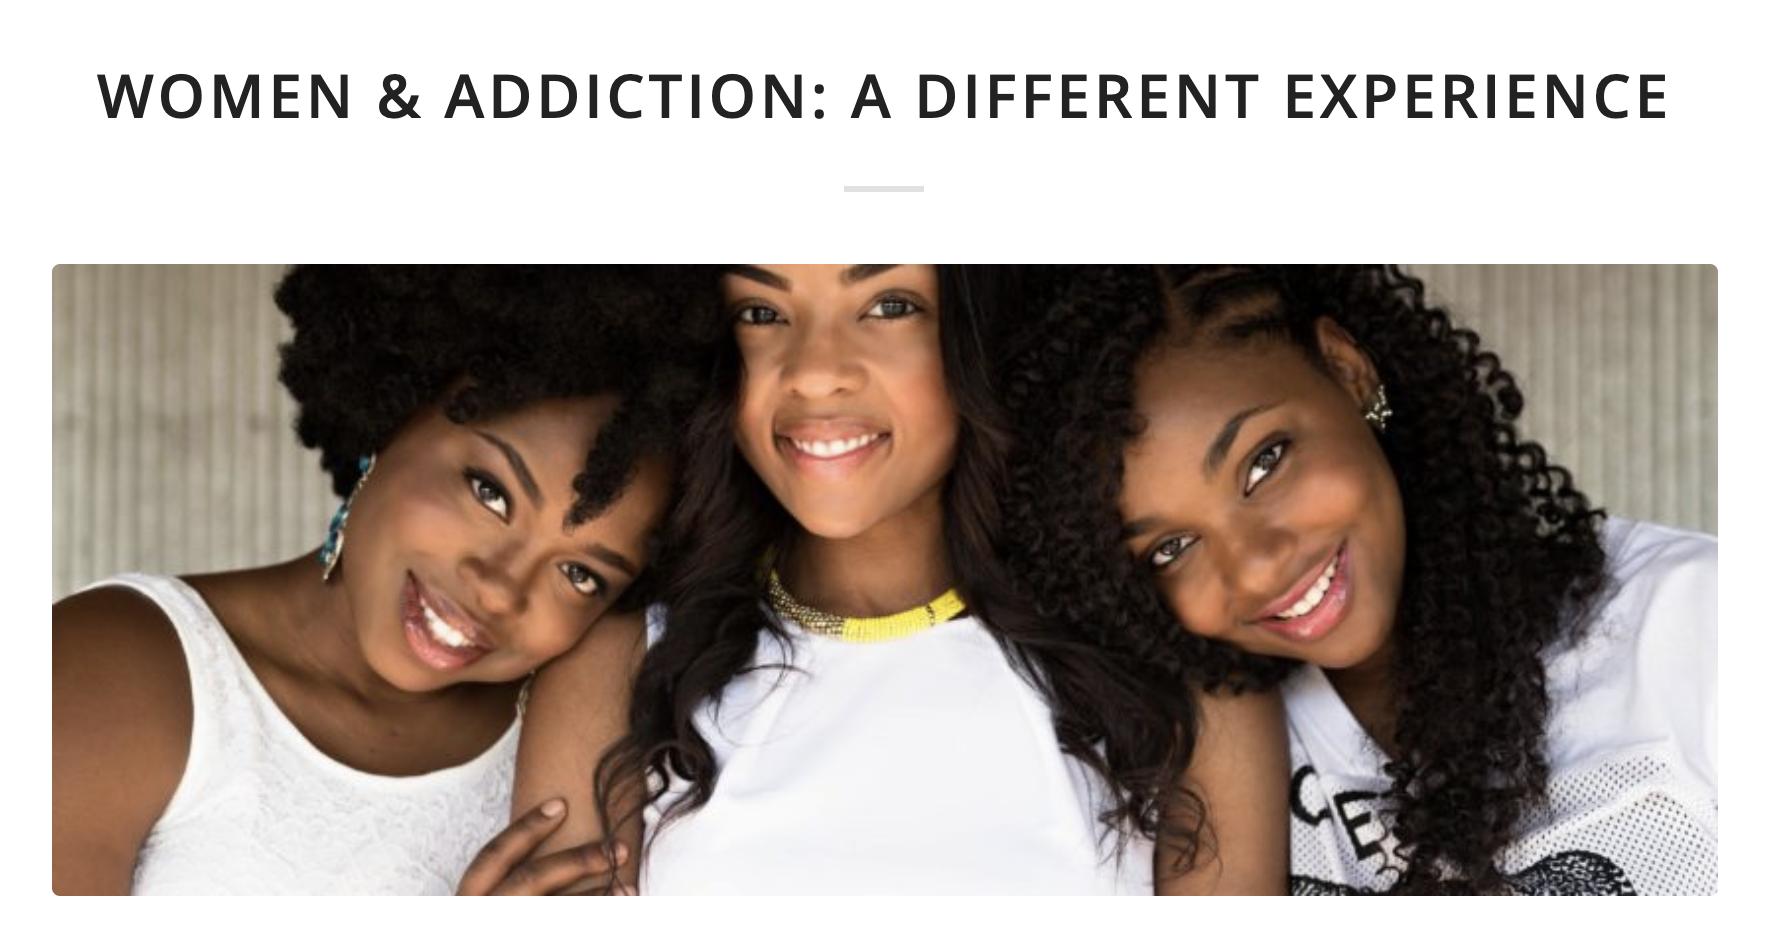 Women & Addiction